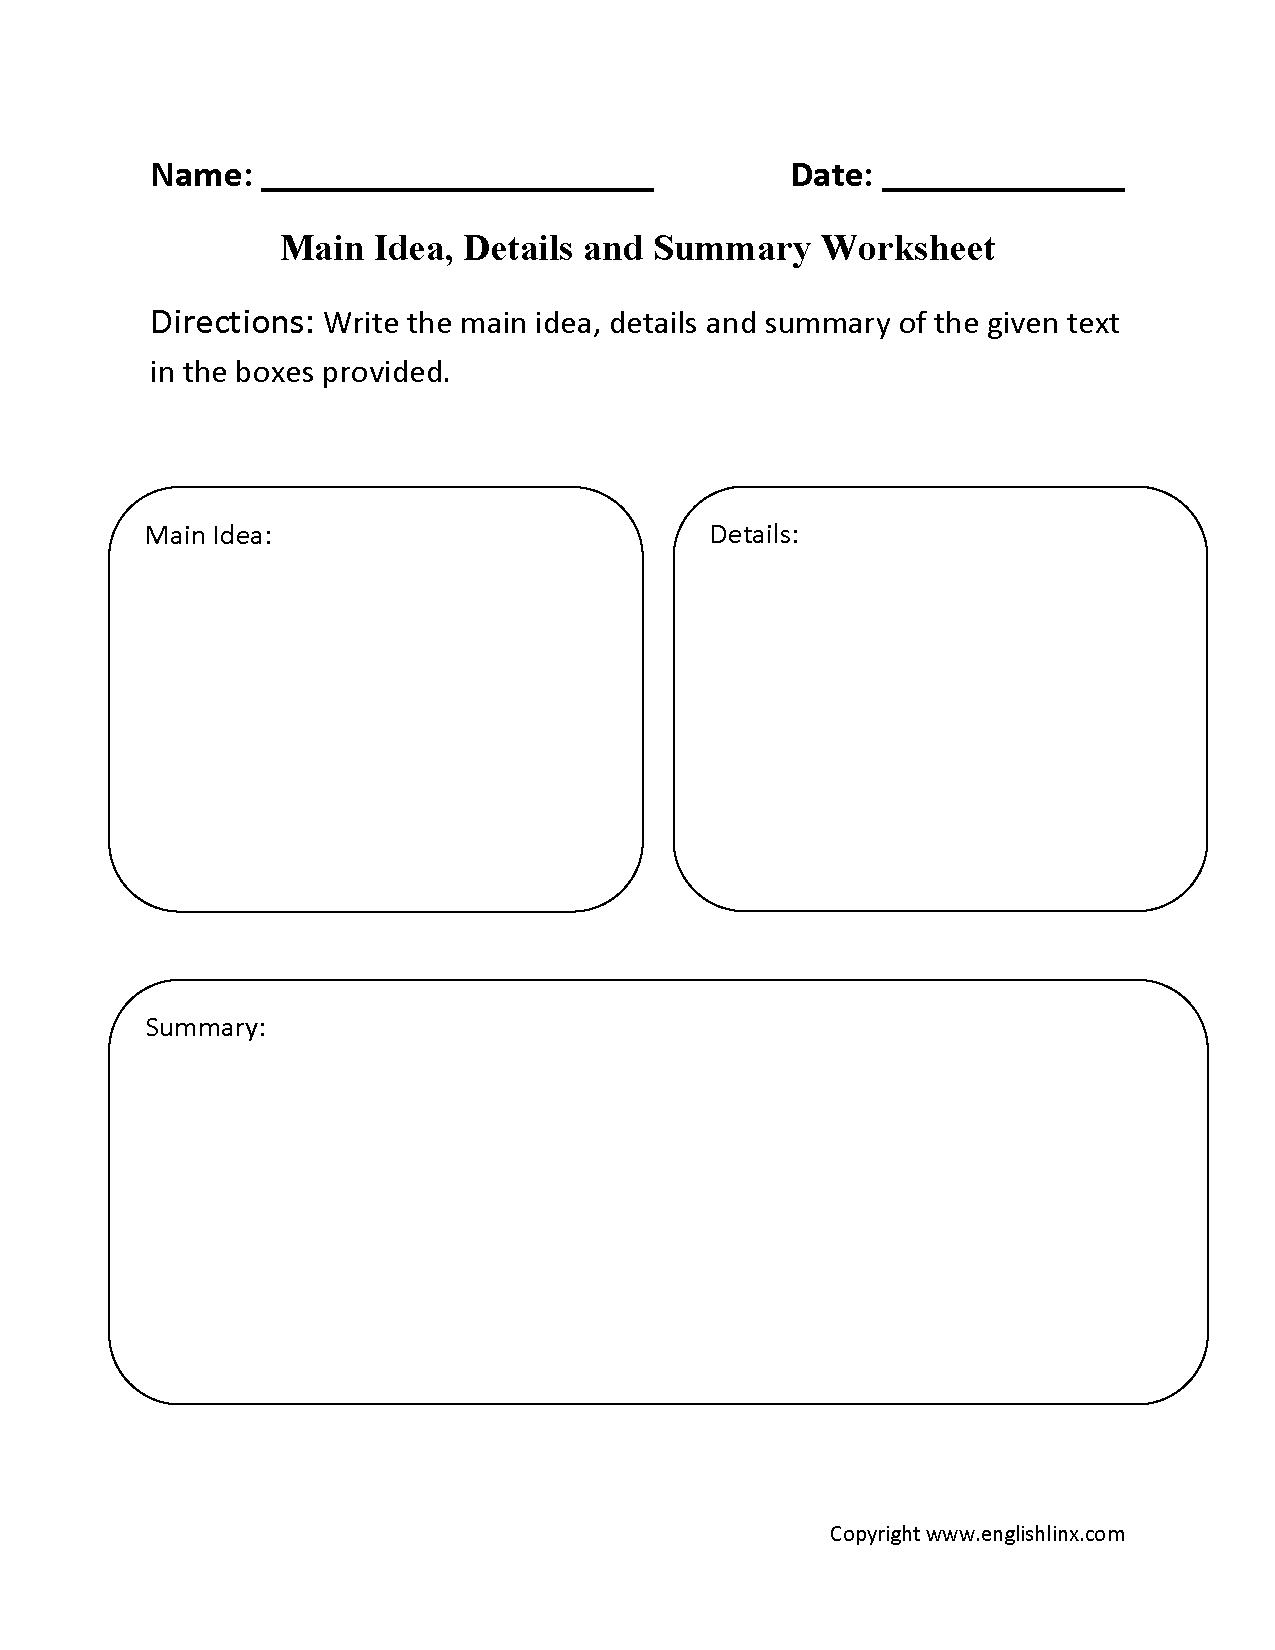 Main Idea Worksheets   Main Idea, Details And Summary Worksheet - Free Printable Main Idea Graphic Organizer